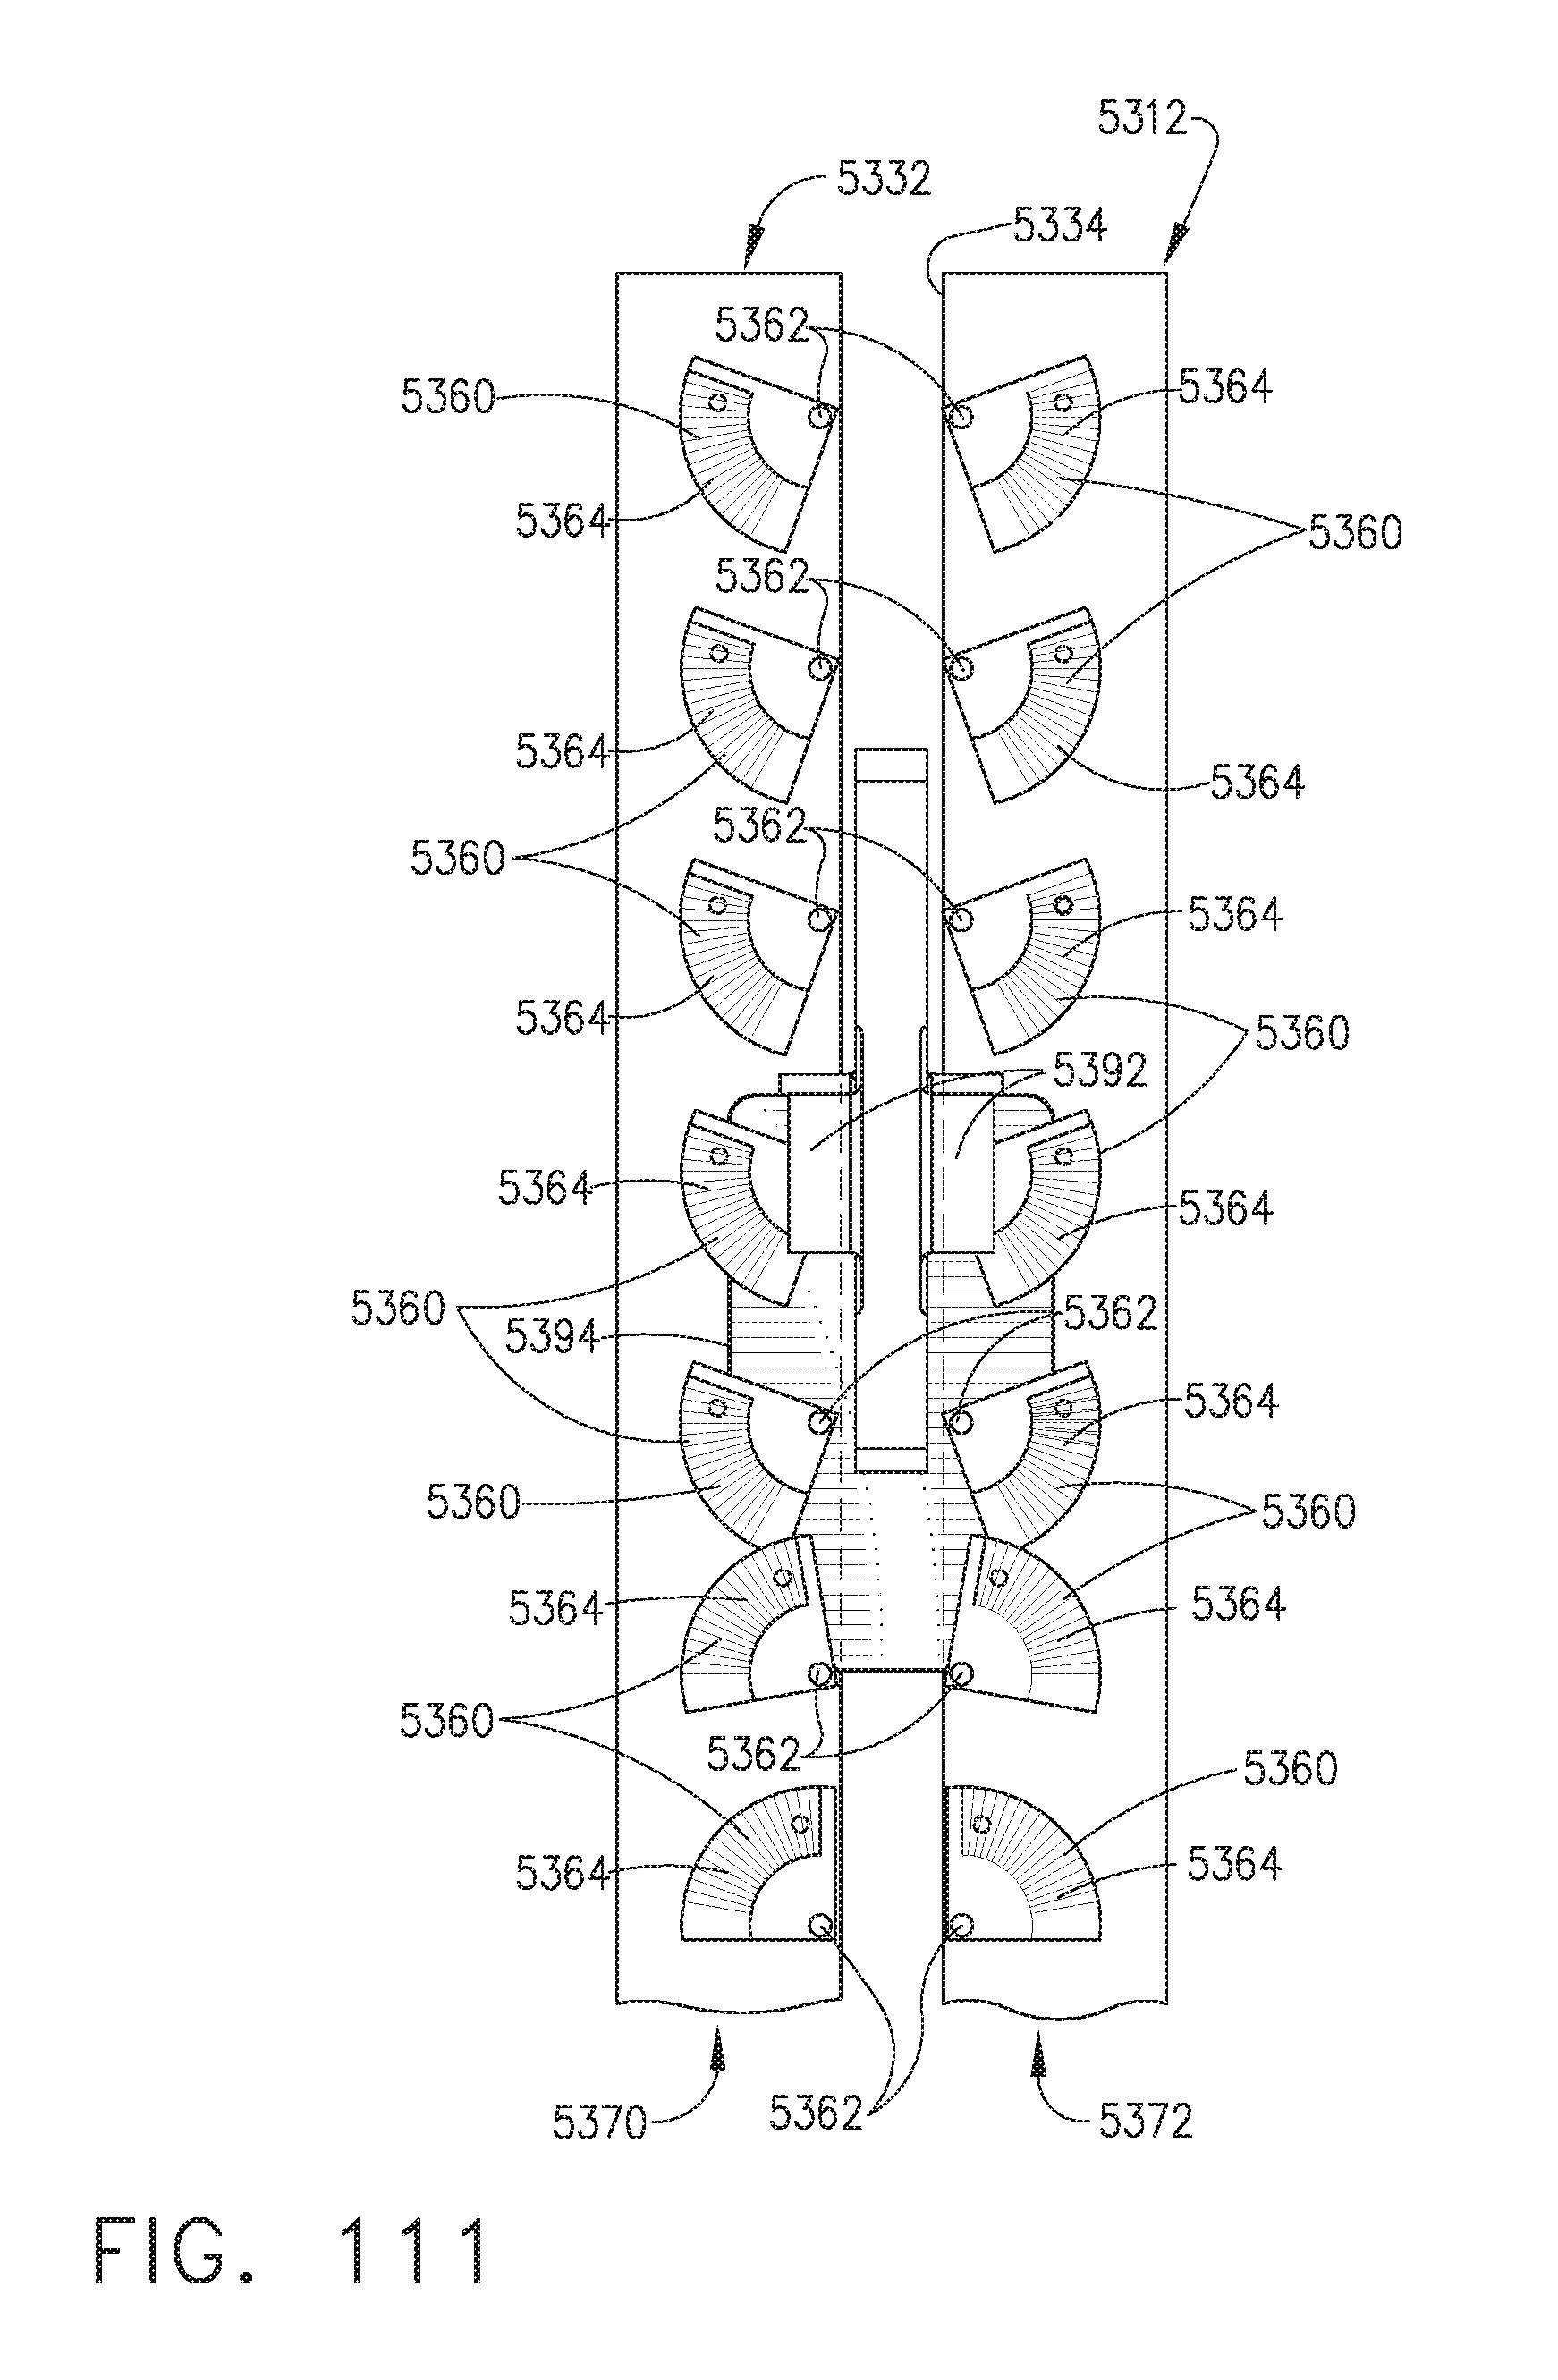 Us9901346b2 Stapling Assembly Google Patents Disposable Camera Taser Gun Schematics Stun Circuit